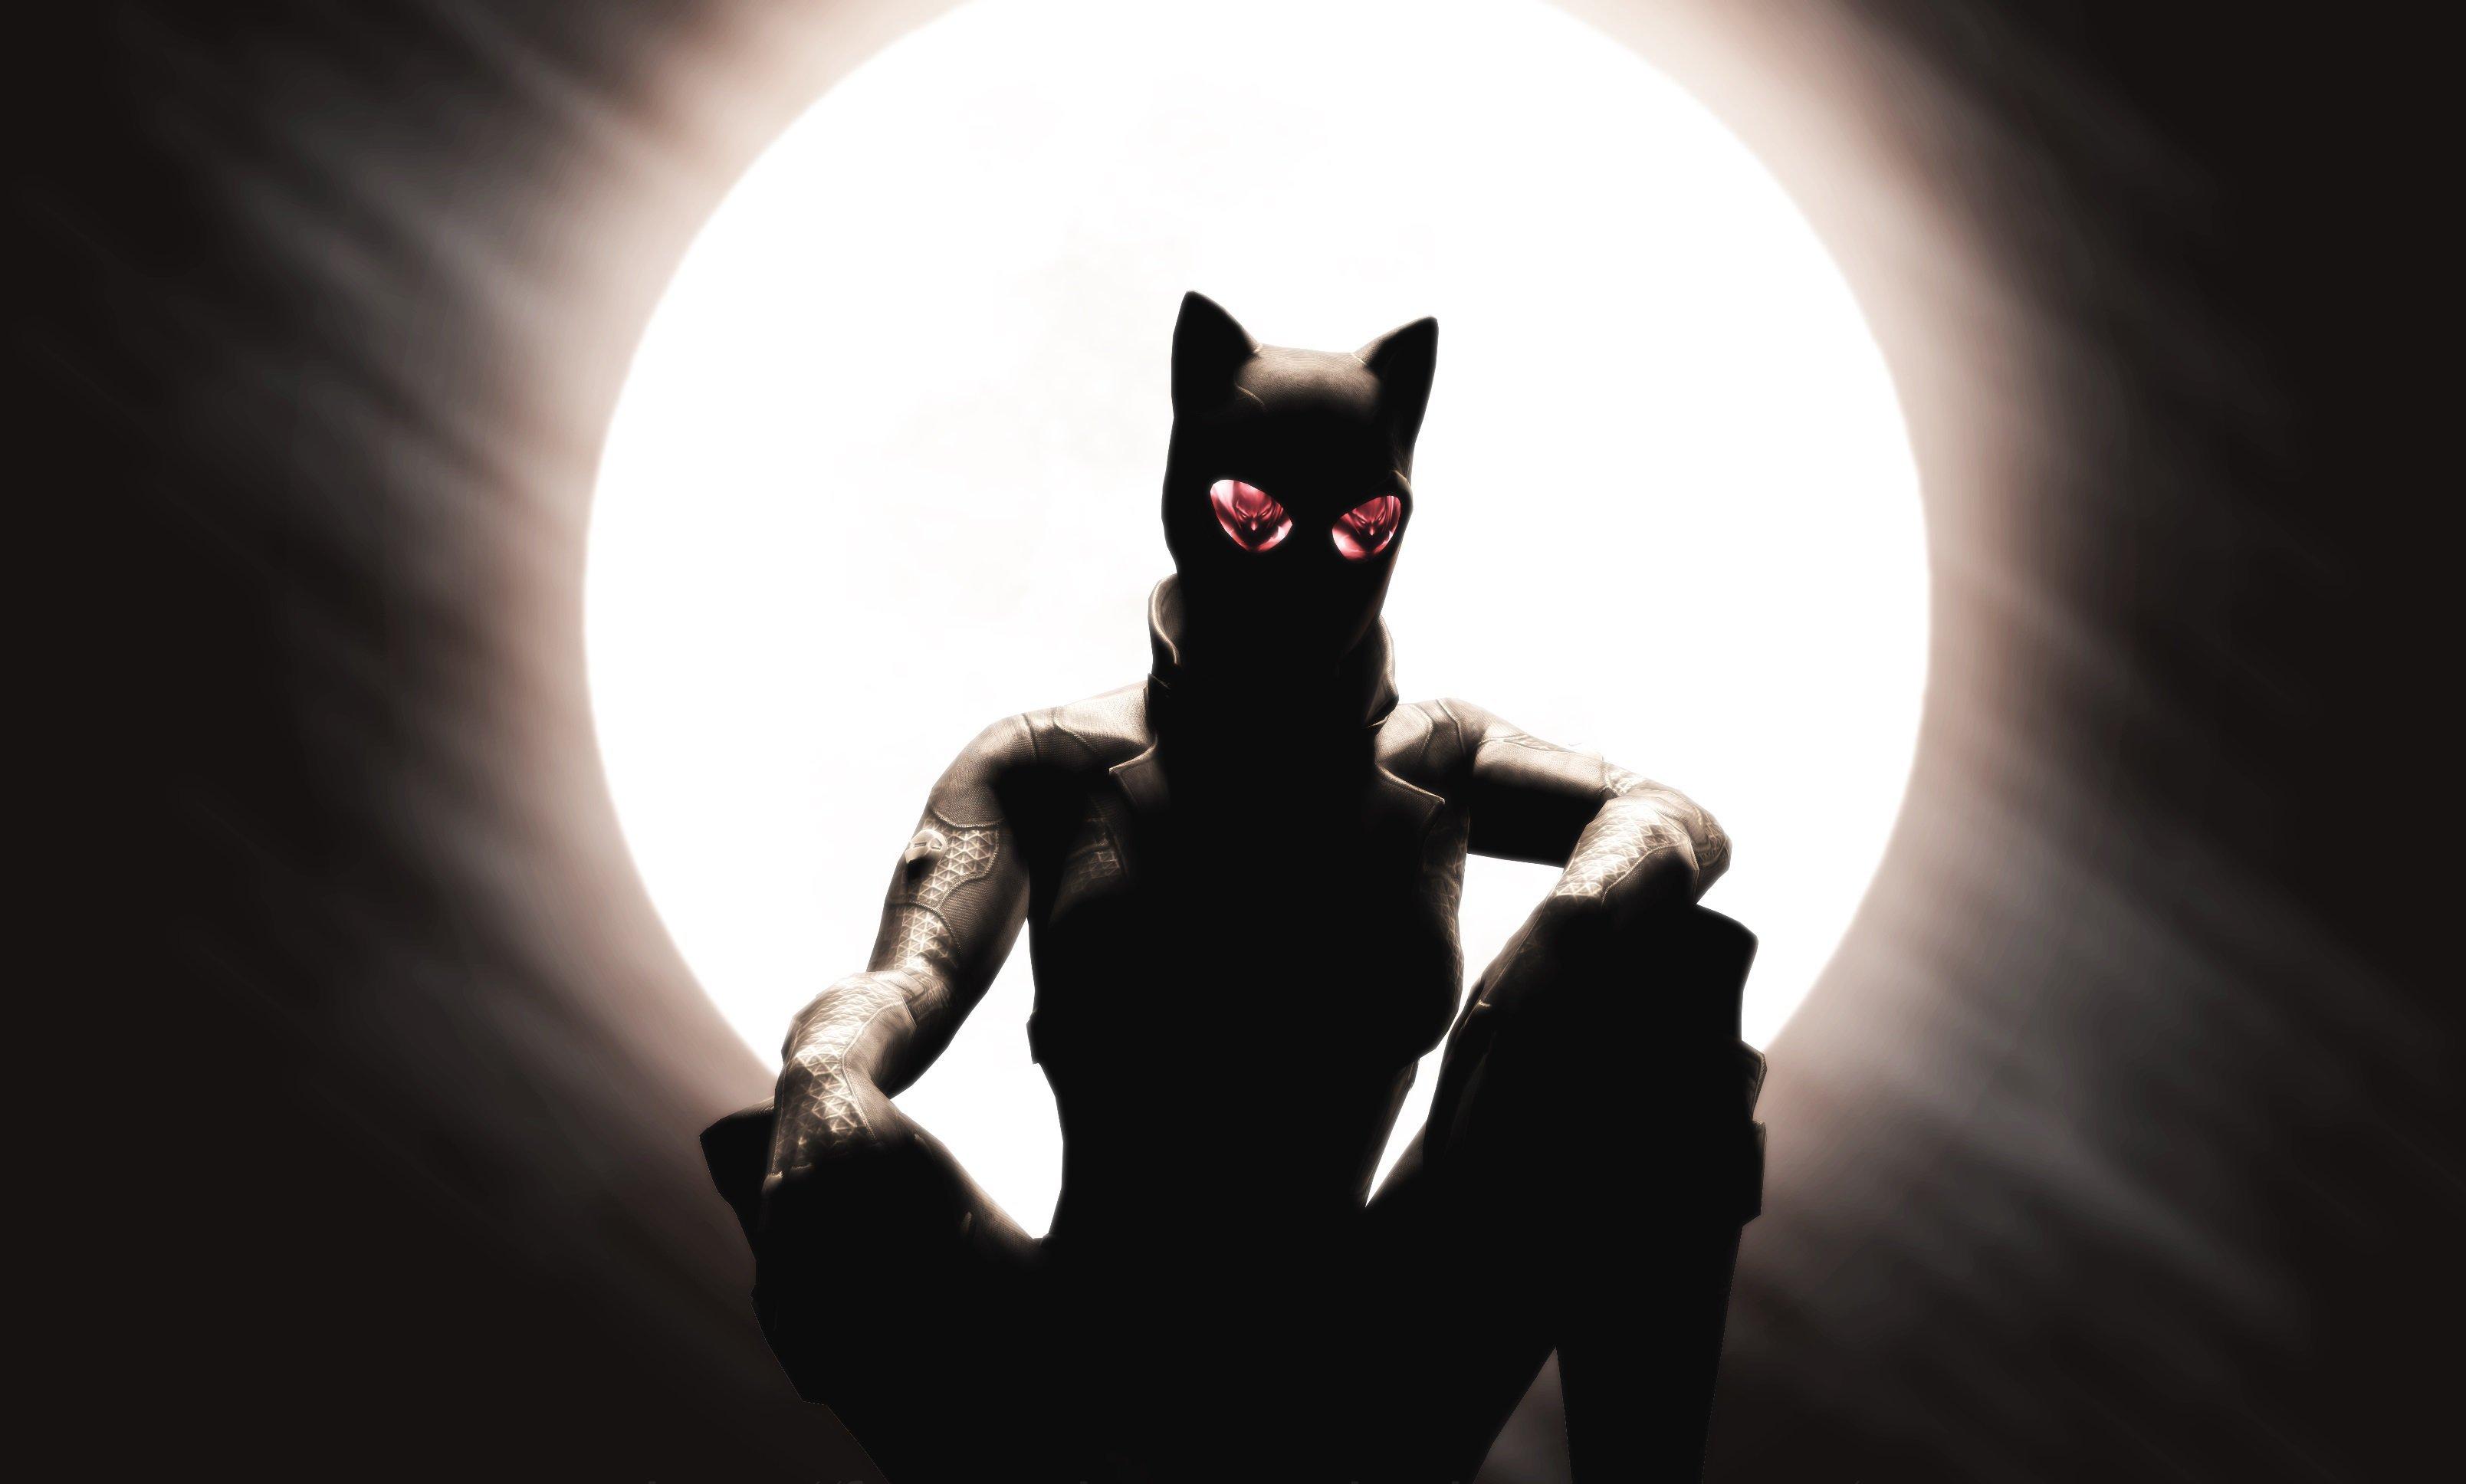 Catwoman Laptop Full HD 1080P